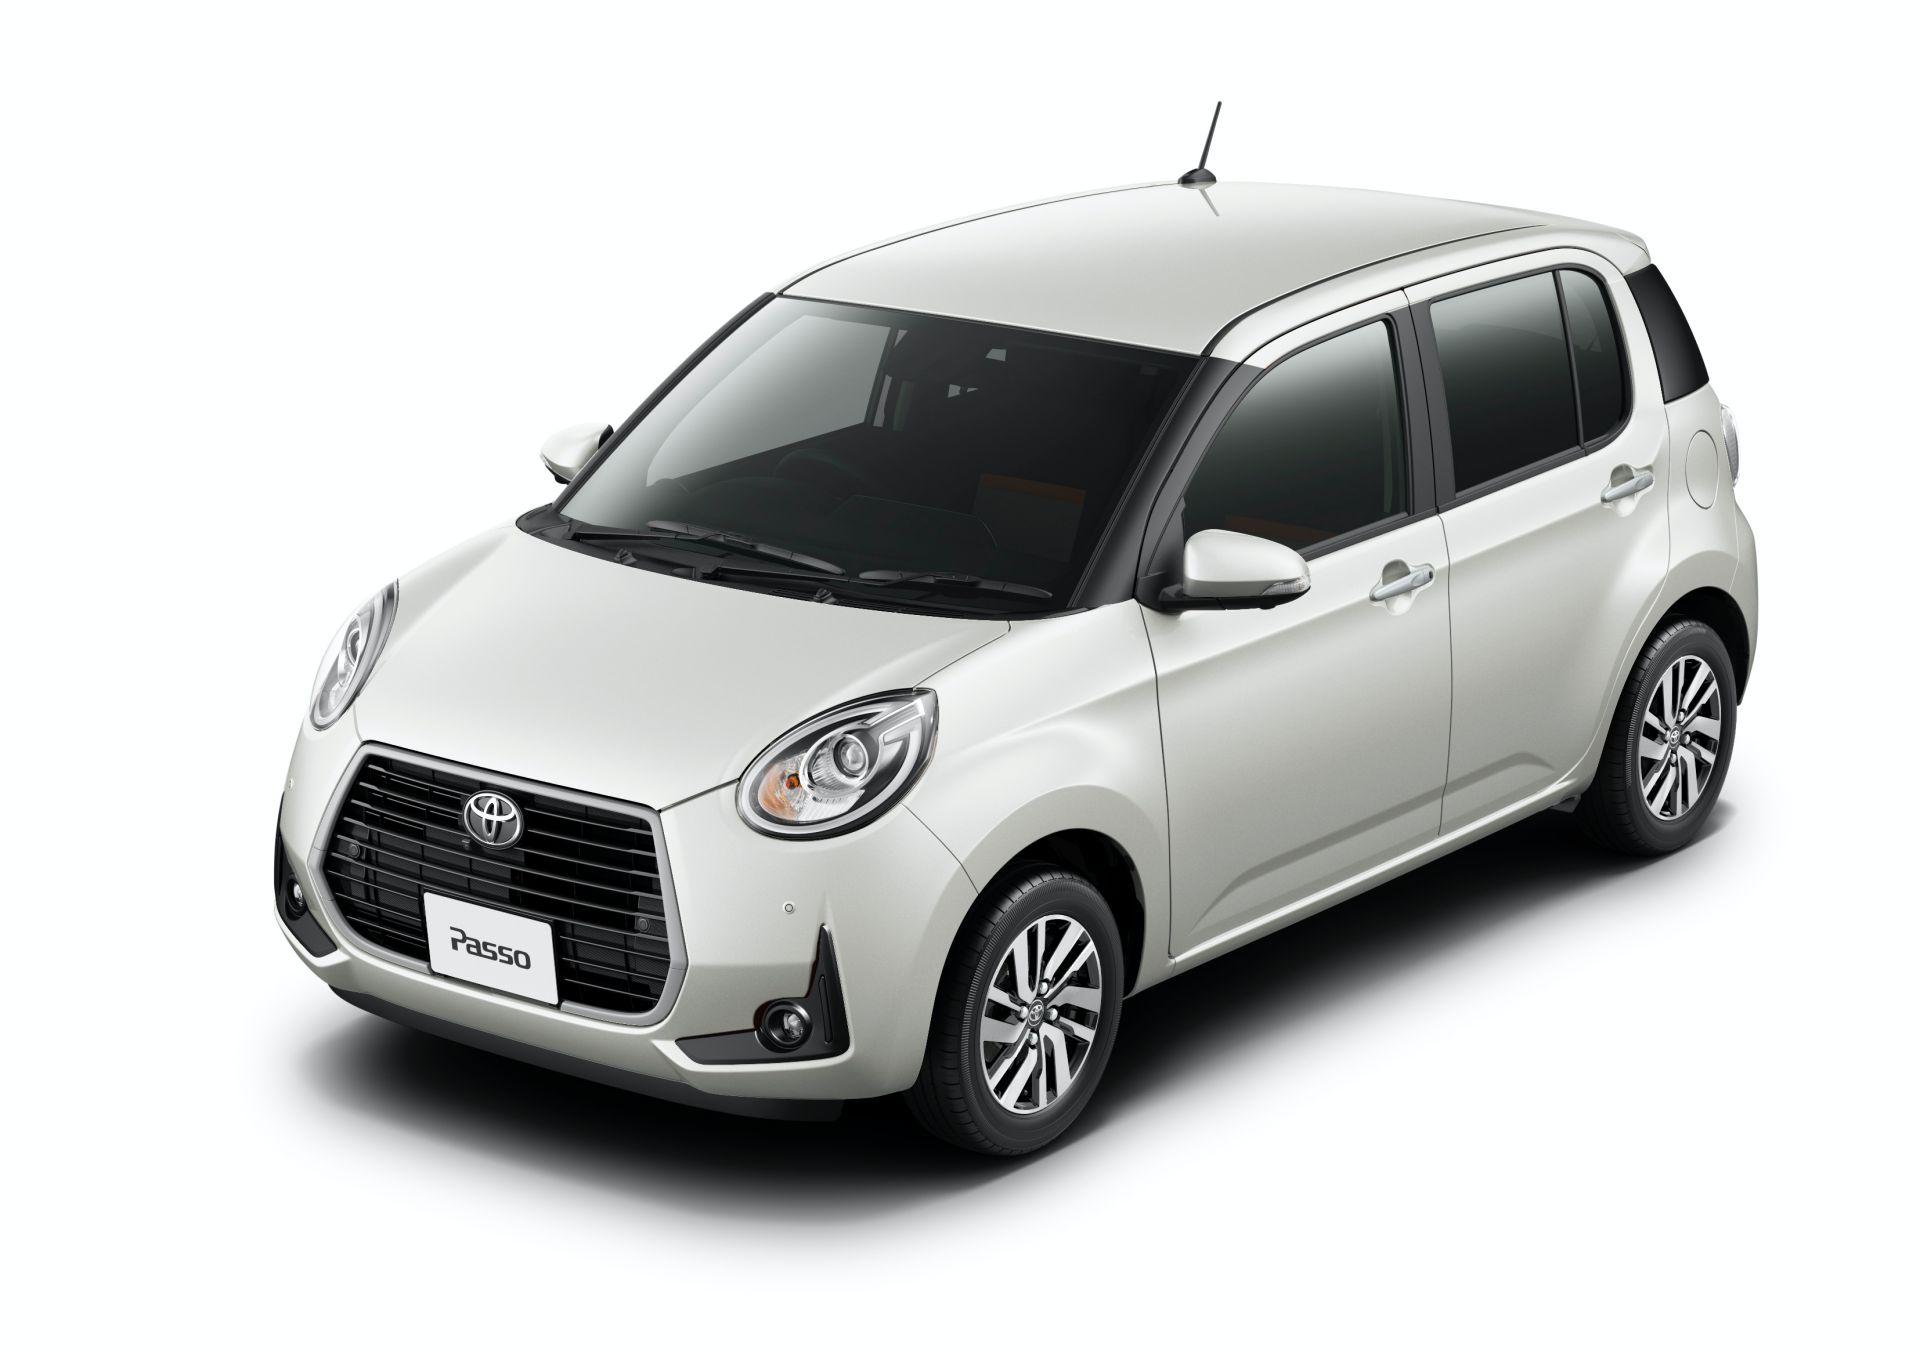 Toyota_Passo_Moda_Charm_0007